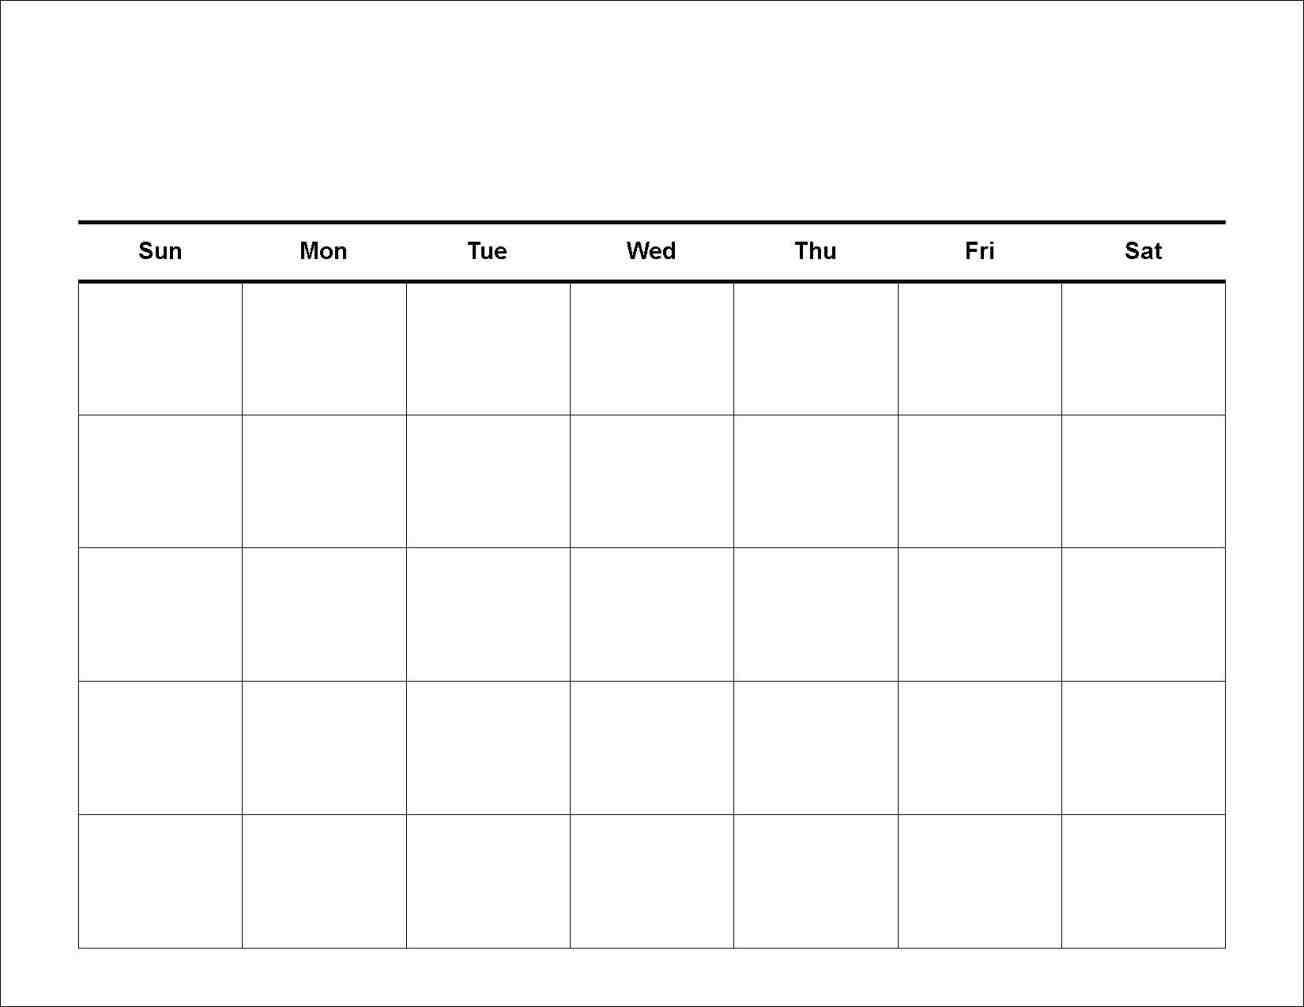 Free 7 Day Blank Calendar | Igotlockedout within 7 Day Week Blank Calendar Printable